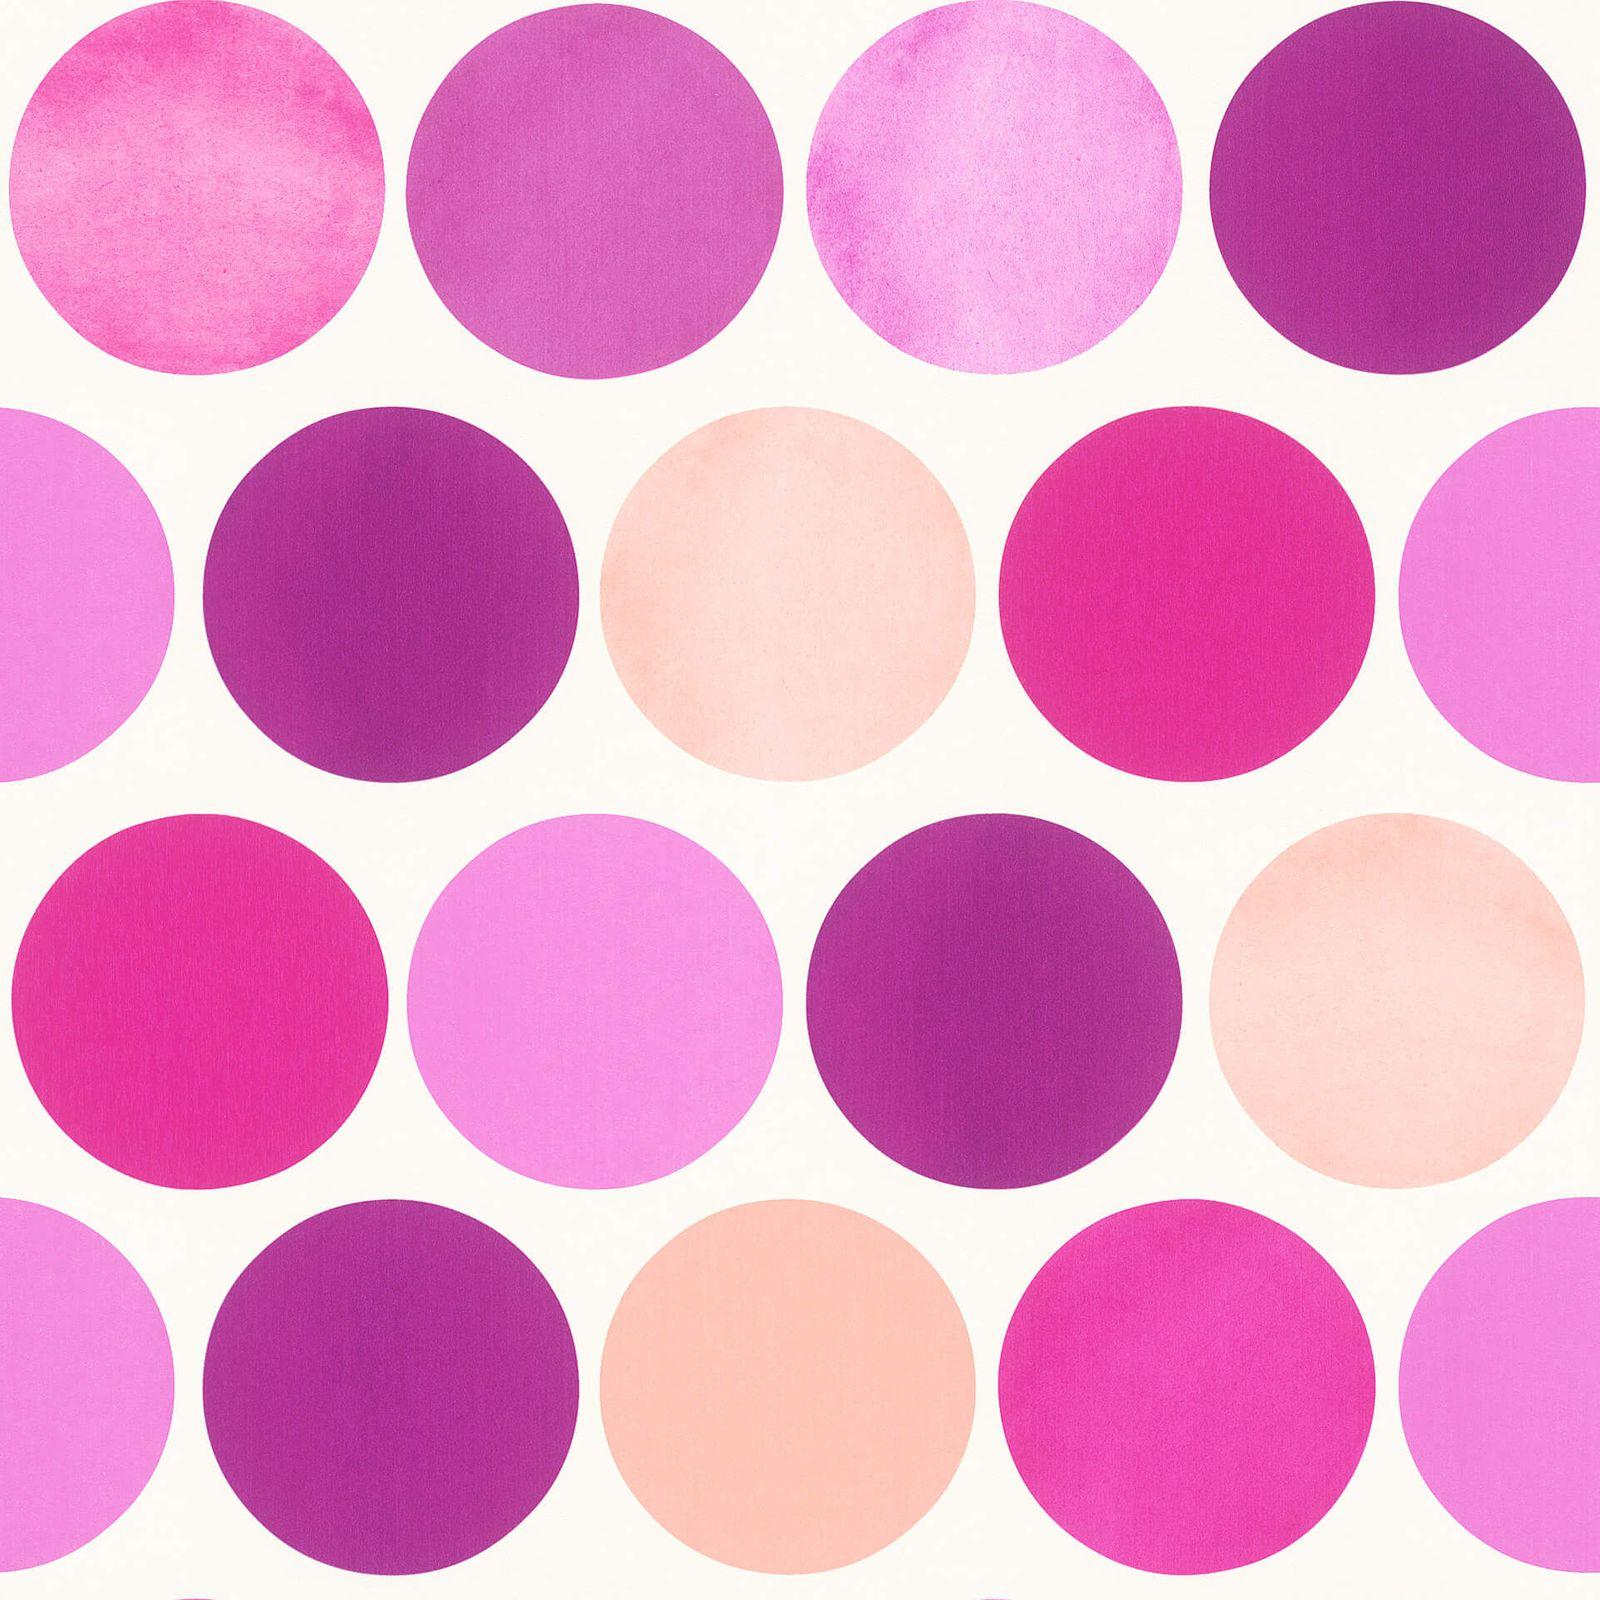 Tapete rasch textil m dchen kreise retro violett 138859 for Tapete violett